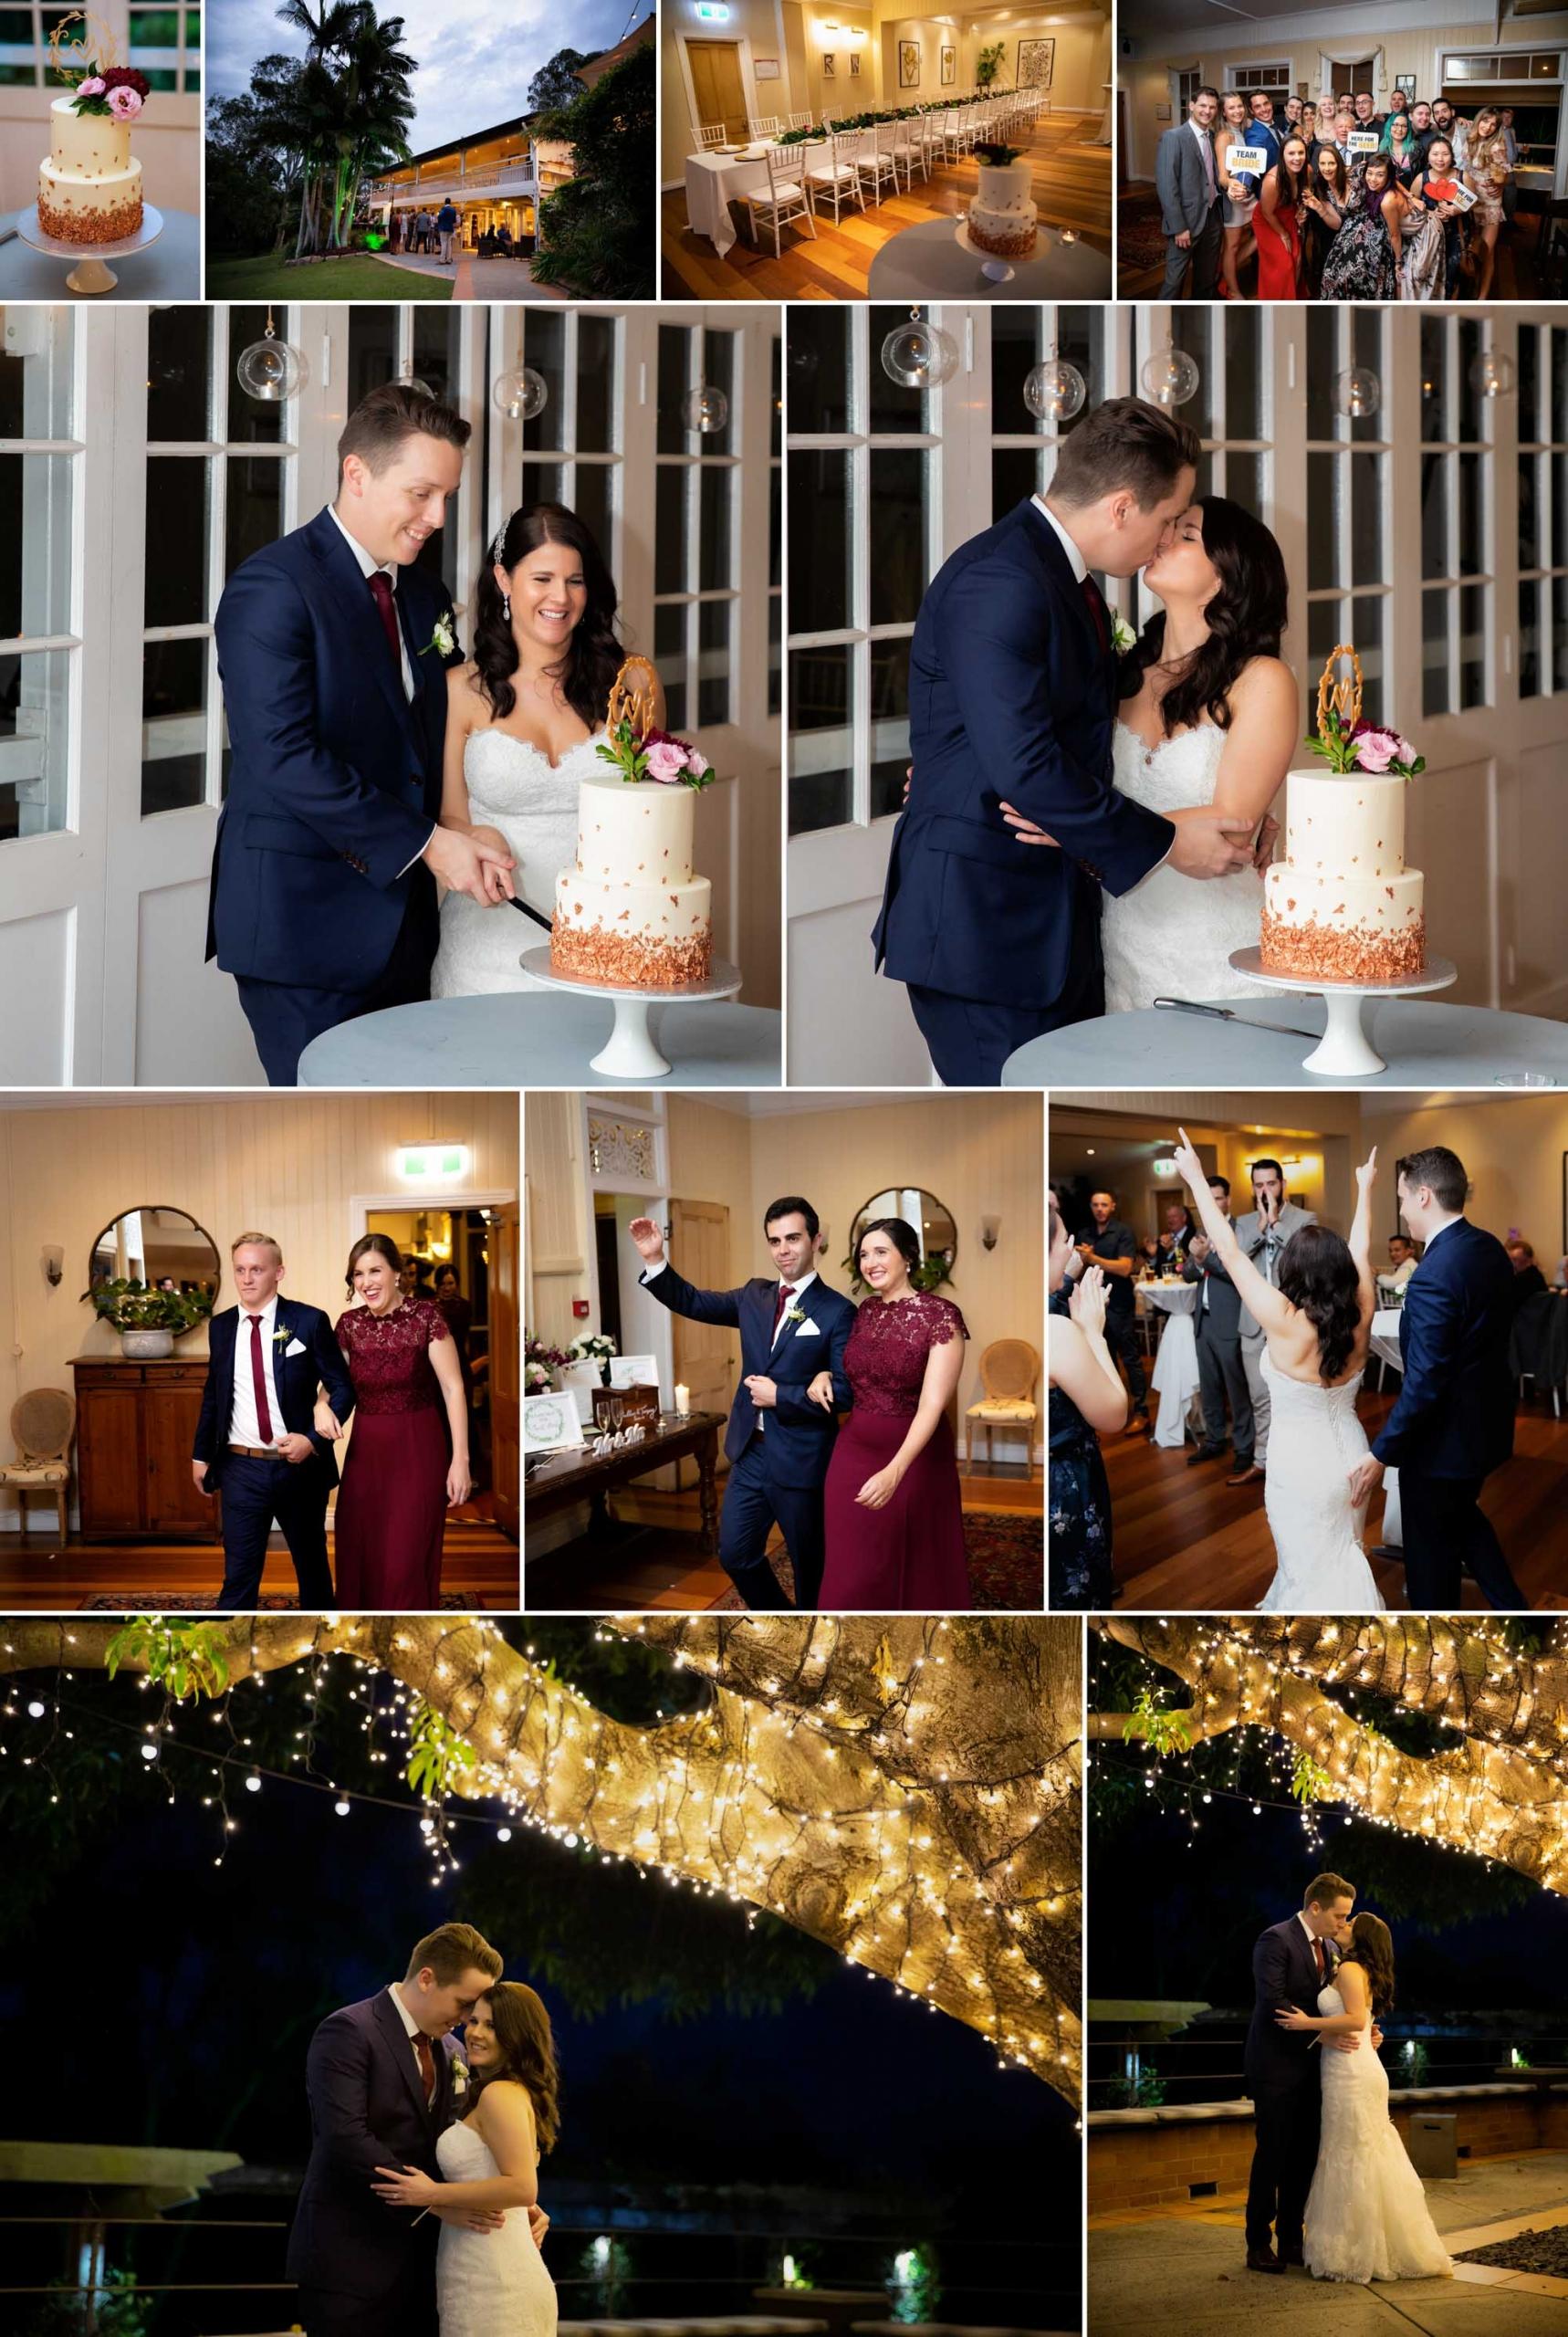 Hillstone St Lucia Wedding reception photographs